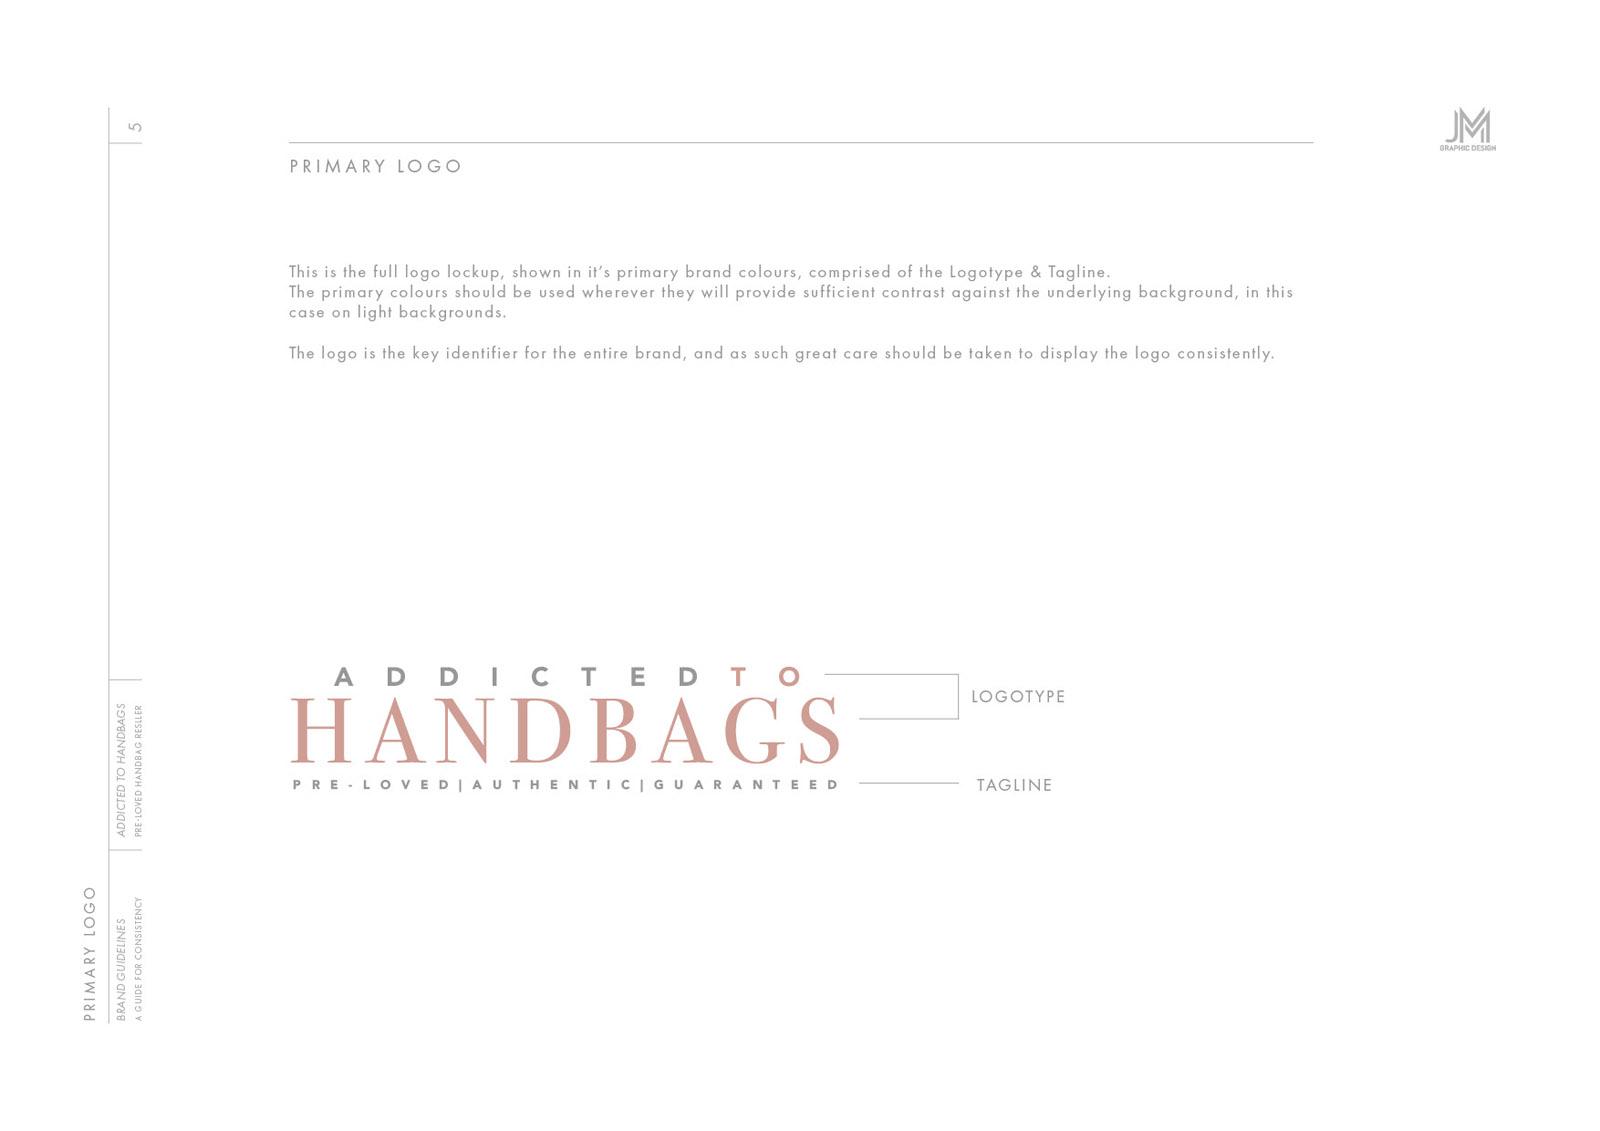 handbag-luxury-brand-identity-logo-design03